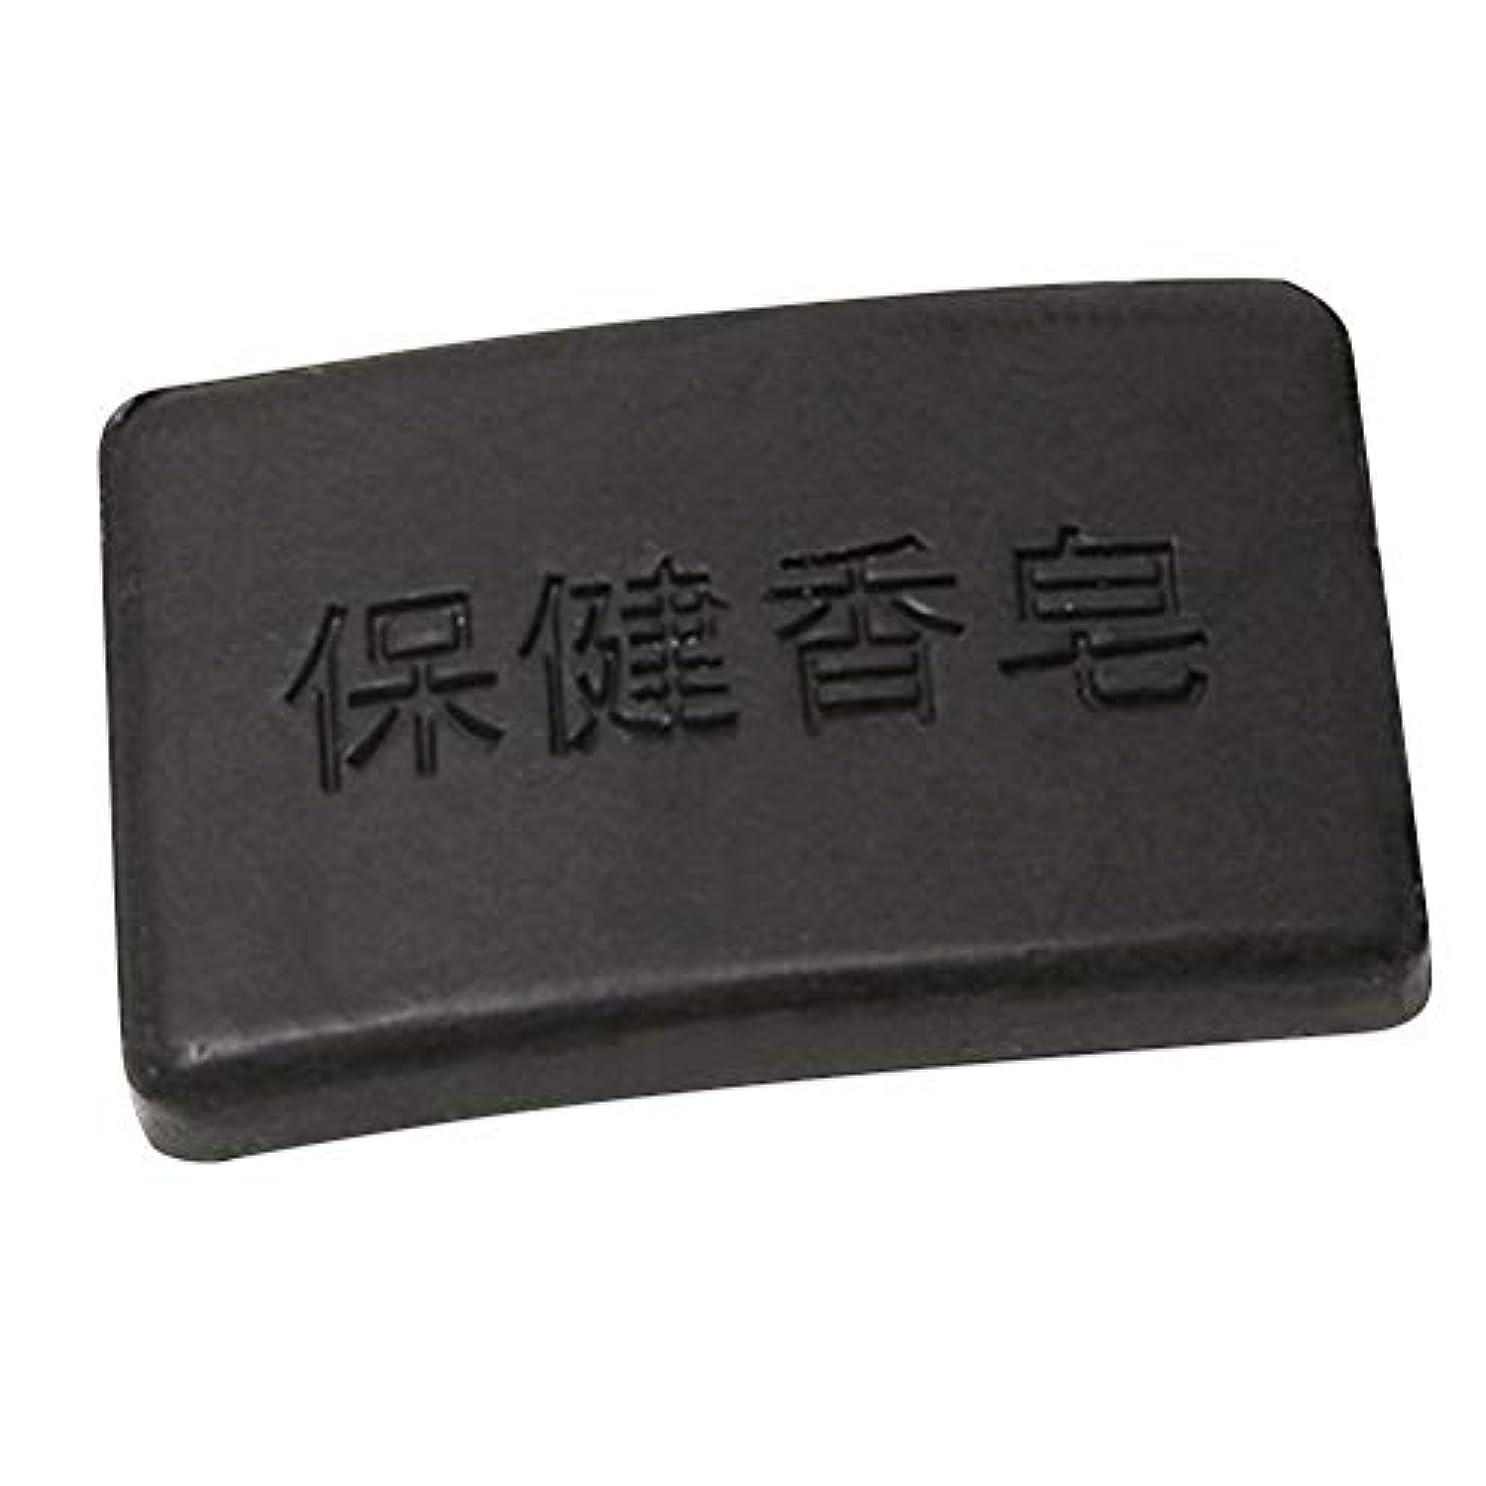 SUPVOX 40グラムプロポリス竹炭石鹸クレンジング健康石鹸入浴石鹸